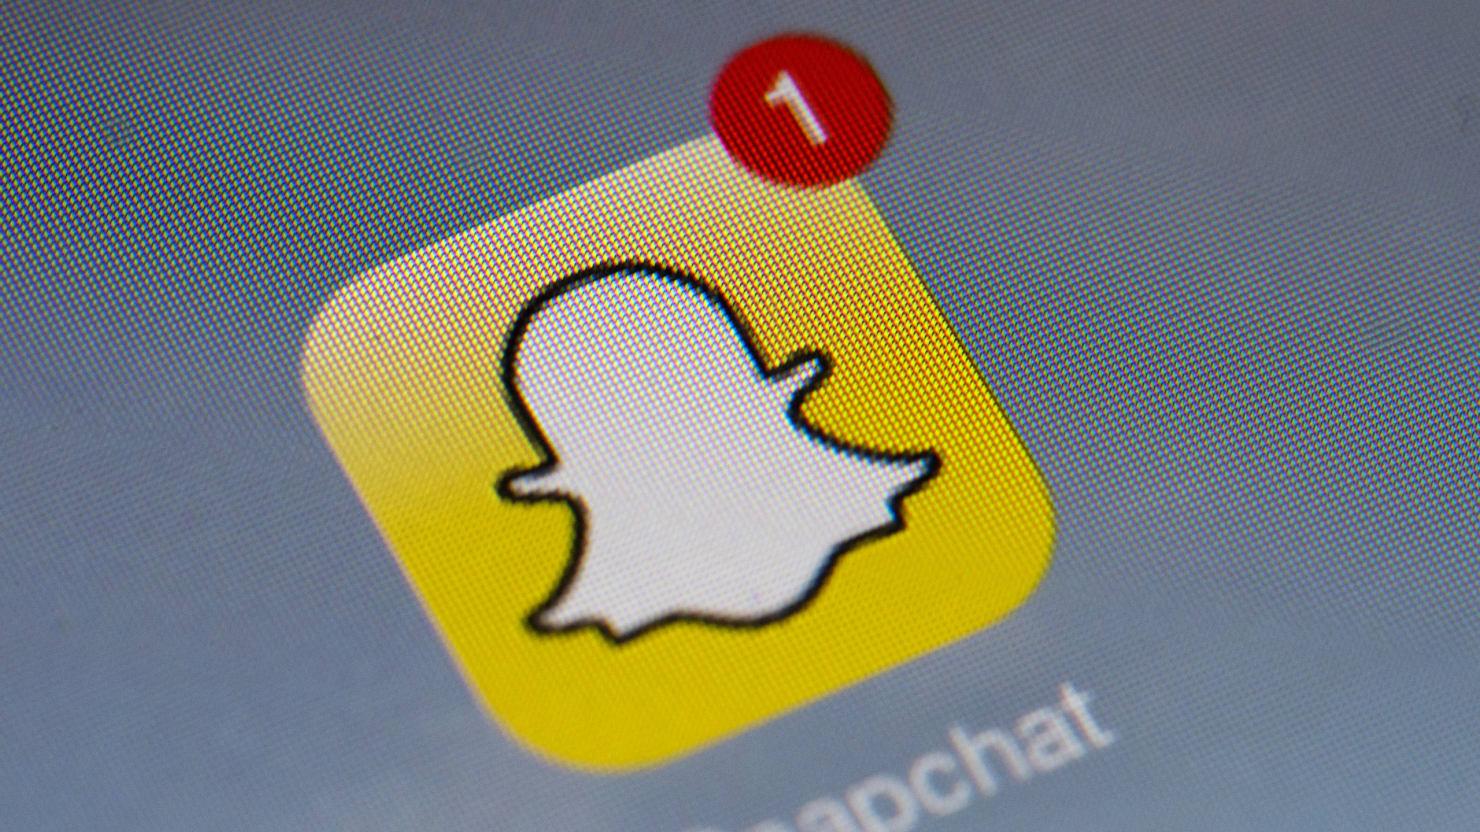 Meet Graham Smith, SnapChat's 16-Year-Old Nemesis